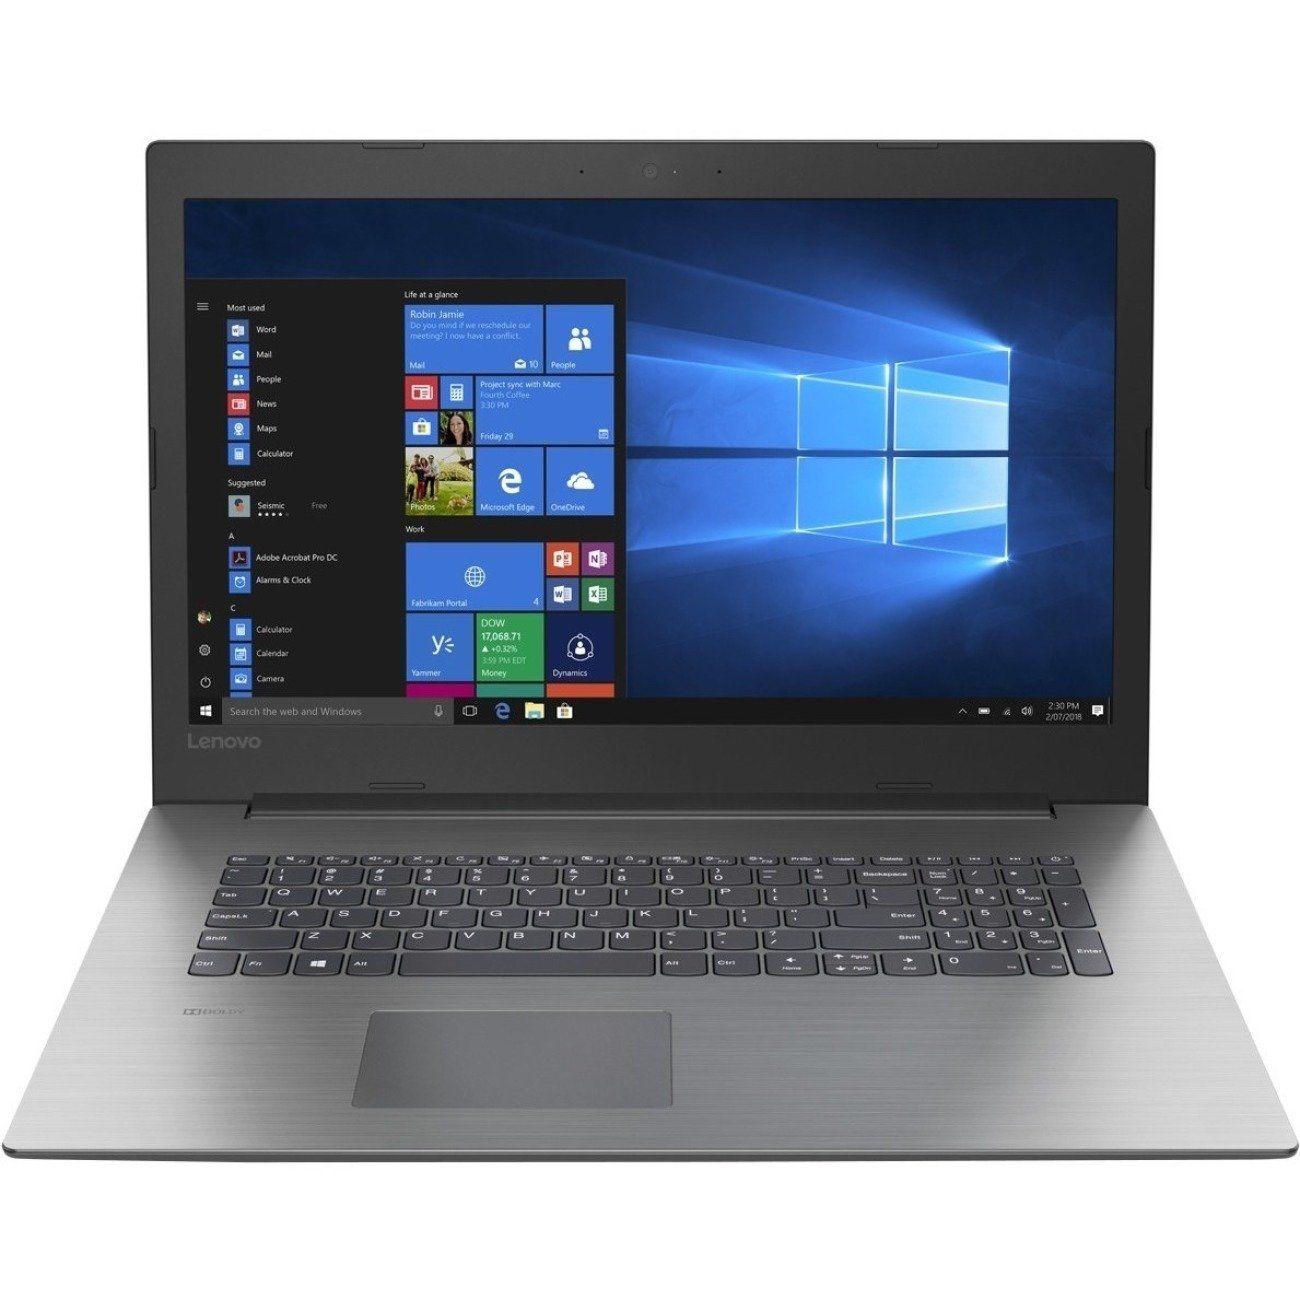 Lenovo Ideapad 330 17ast 81d70001us 17 3 Notebook 1600 X 900 A Series A6 9225 4 Gb Ram 1 Tb Hdd Platinum White Lenovo Ideapad Laptop Price Lenovo